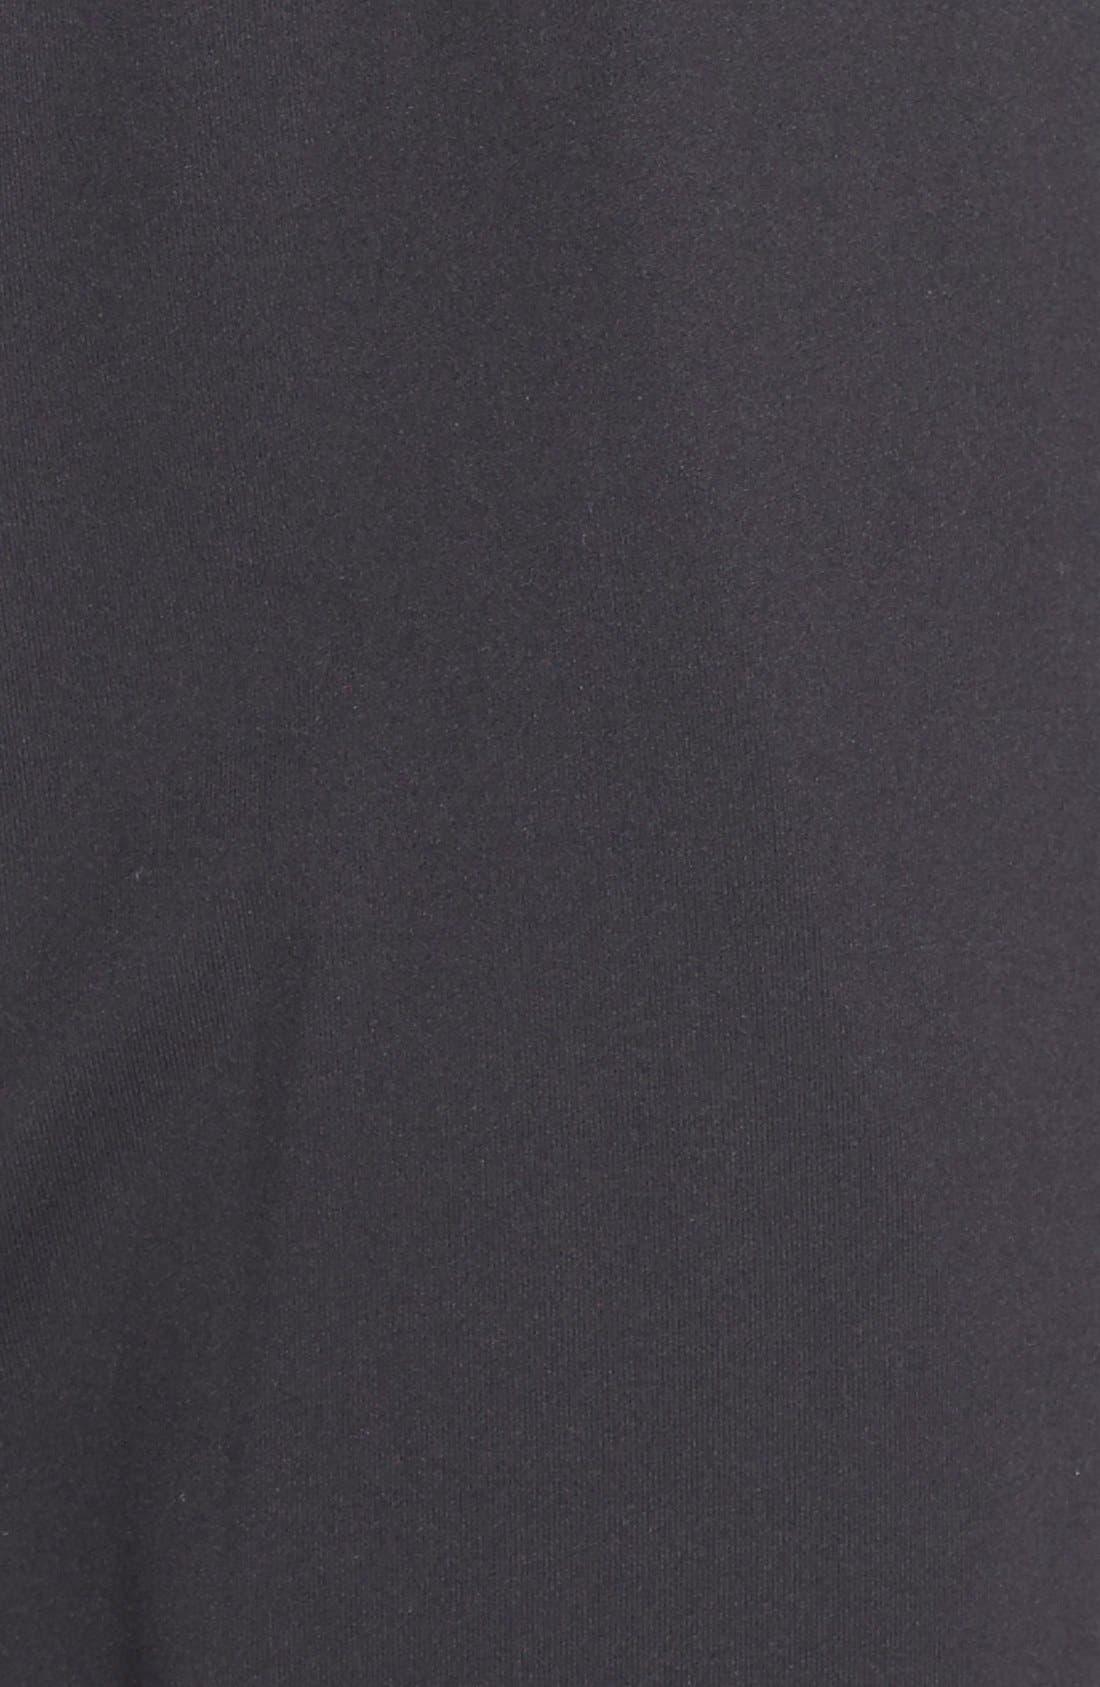 'Downtown' Knit Jogger Pants,                             Alternate thumbnail 2, color,                             001